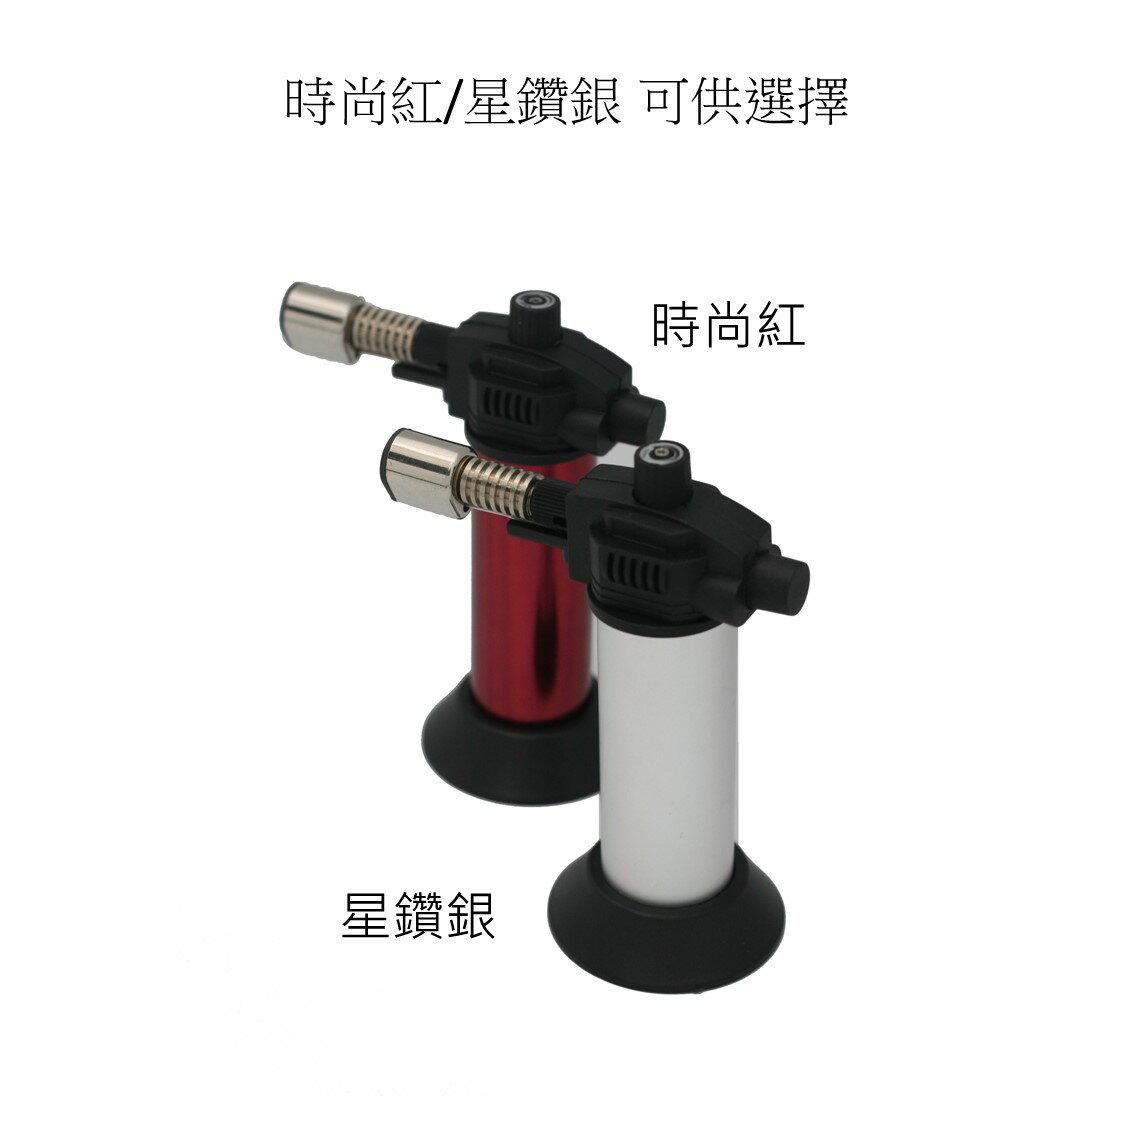 MT-806 【中型瓦斯噴槍】瓦斯噴槍 / 加溫解凍 / 戶外用品 / 廚房用品 / 料理炙燒 / 專業烘焙 2